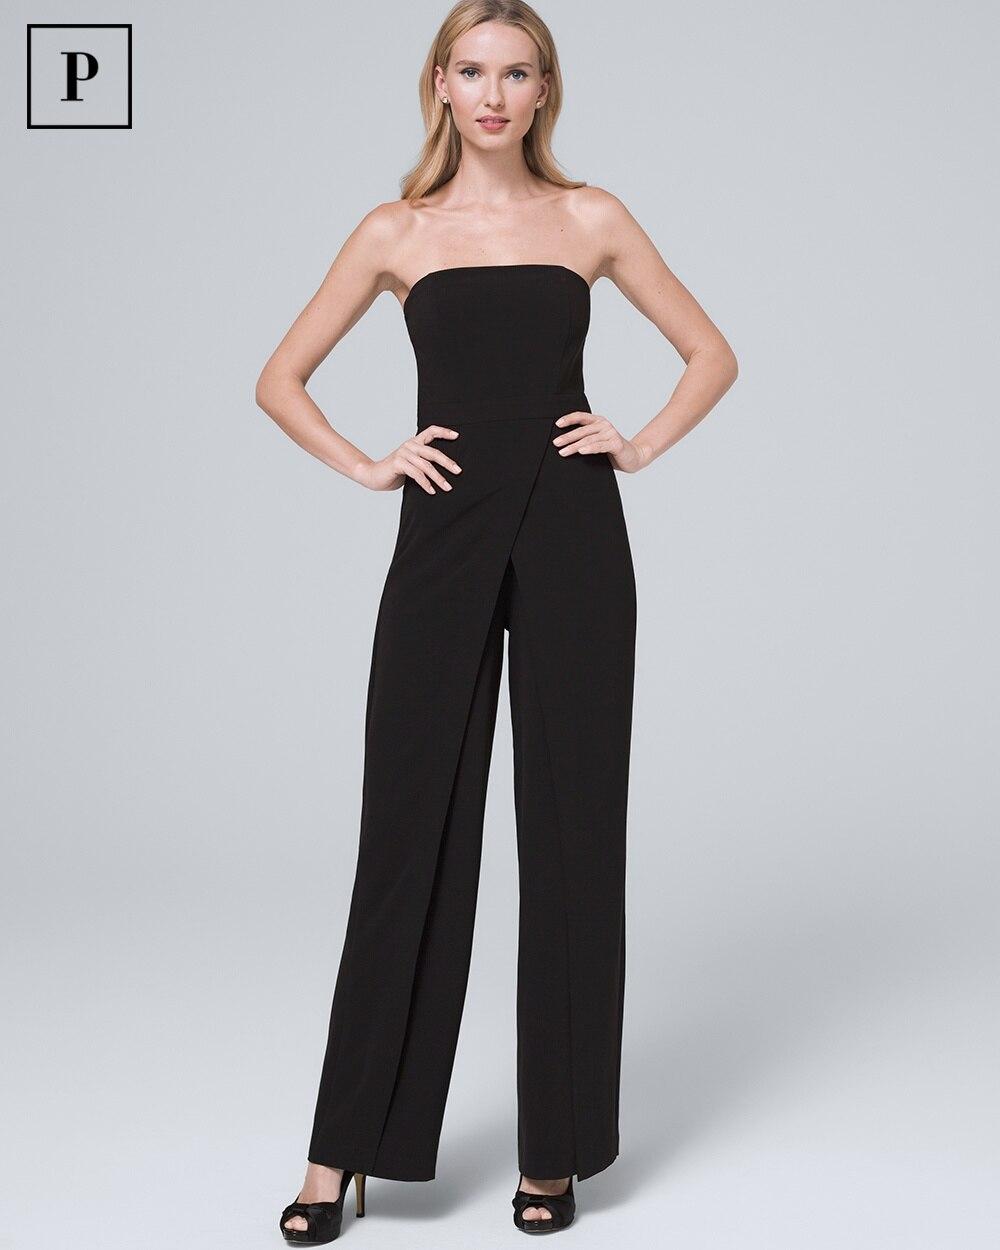 4f159567204fec Petite Convertible Black Strapless Split-Leg Jumpsuit - White House Black  Market